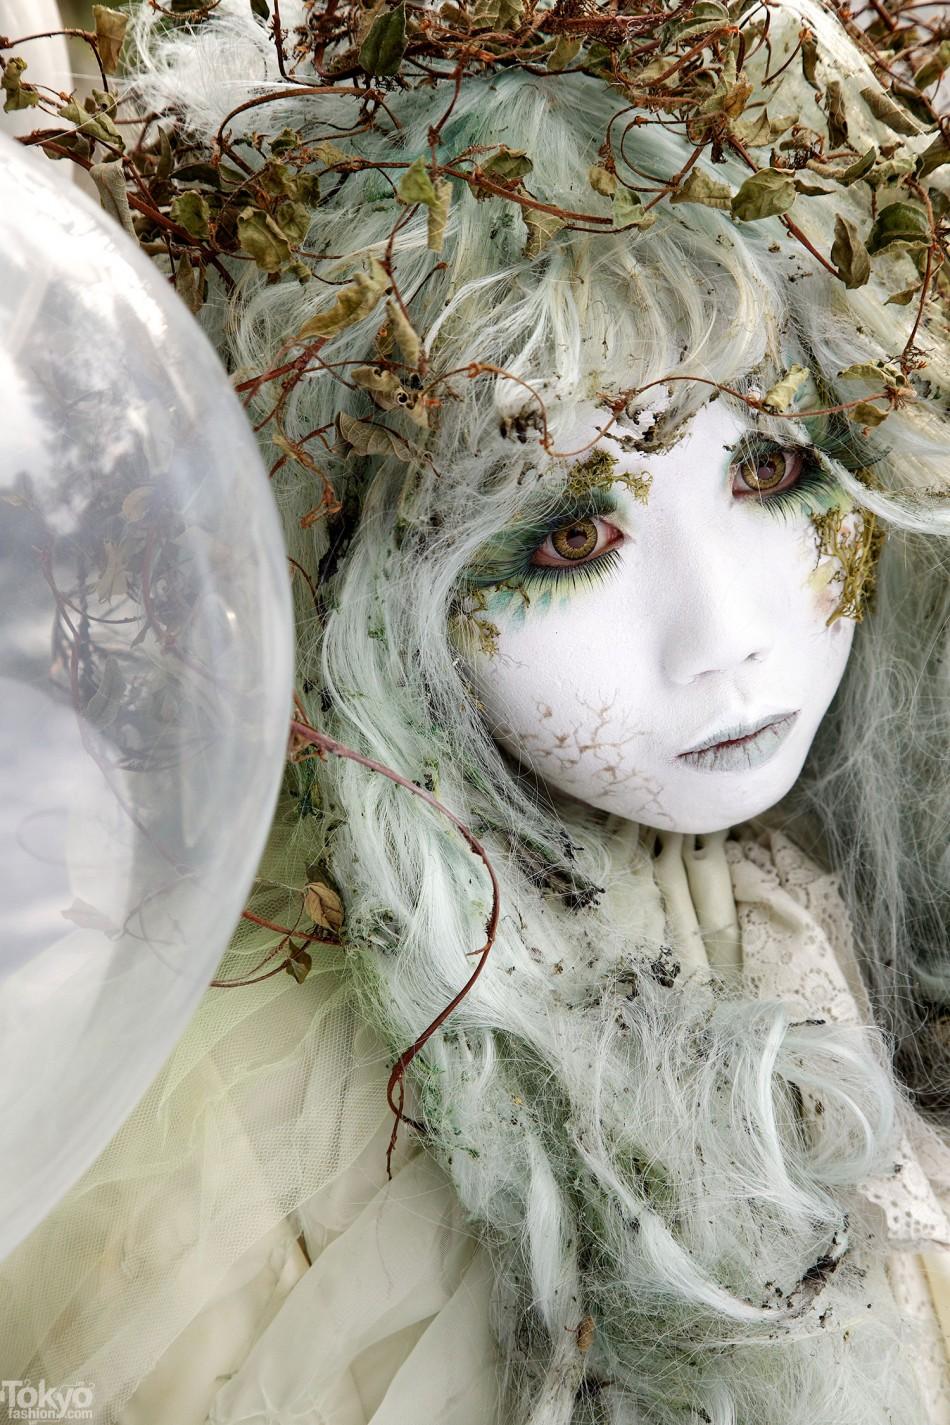 Minori - Her Memories of a Dream (33)